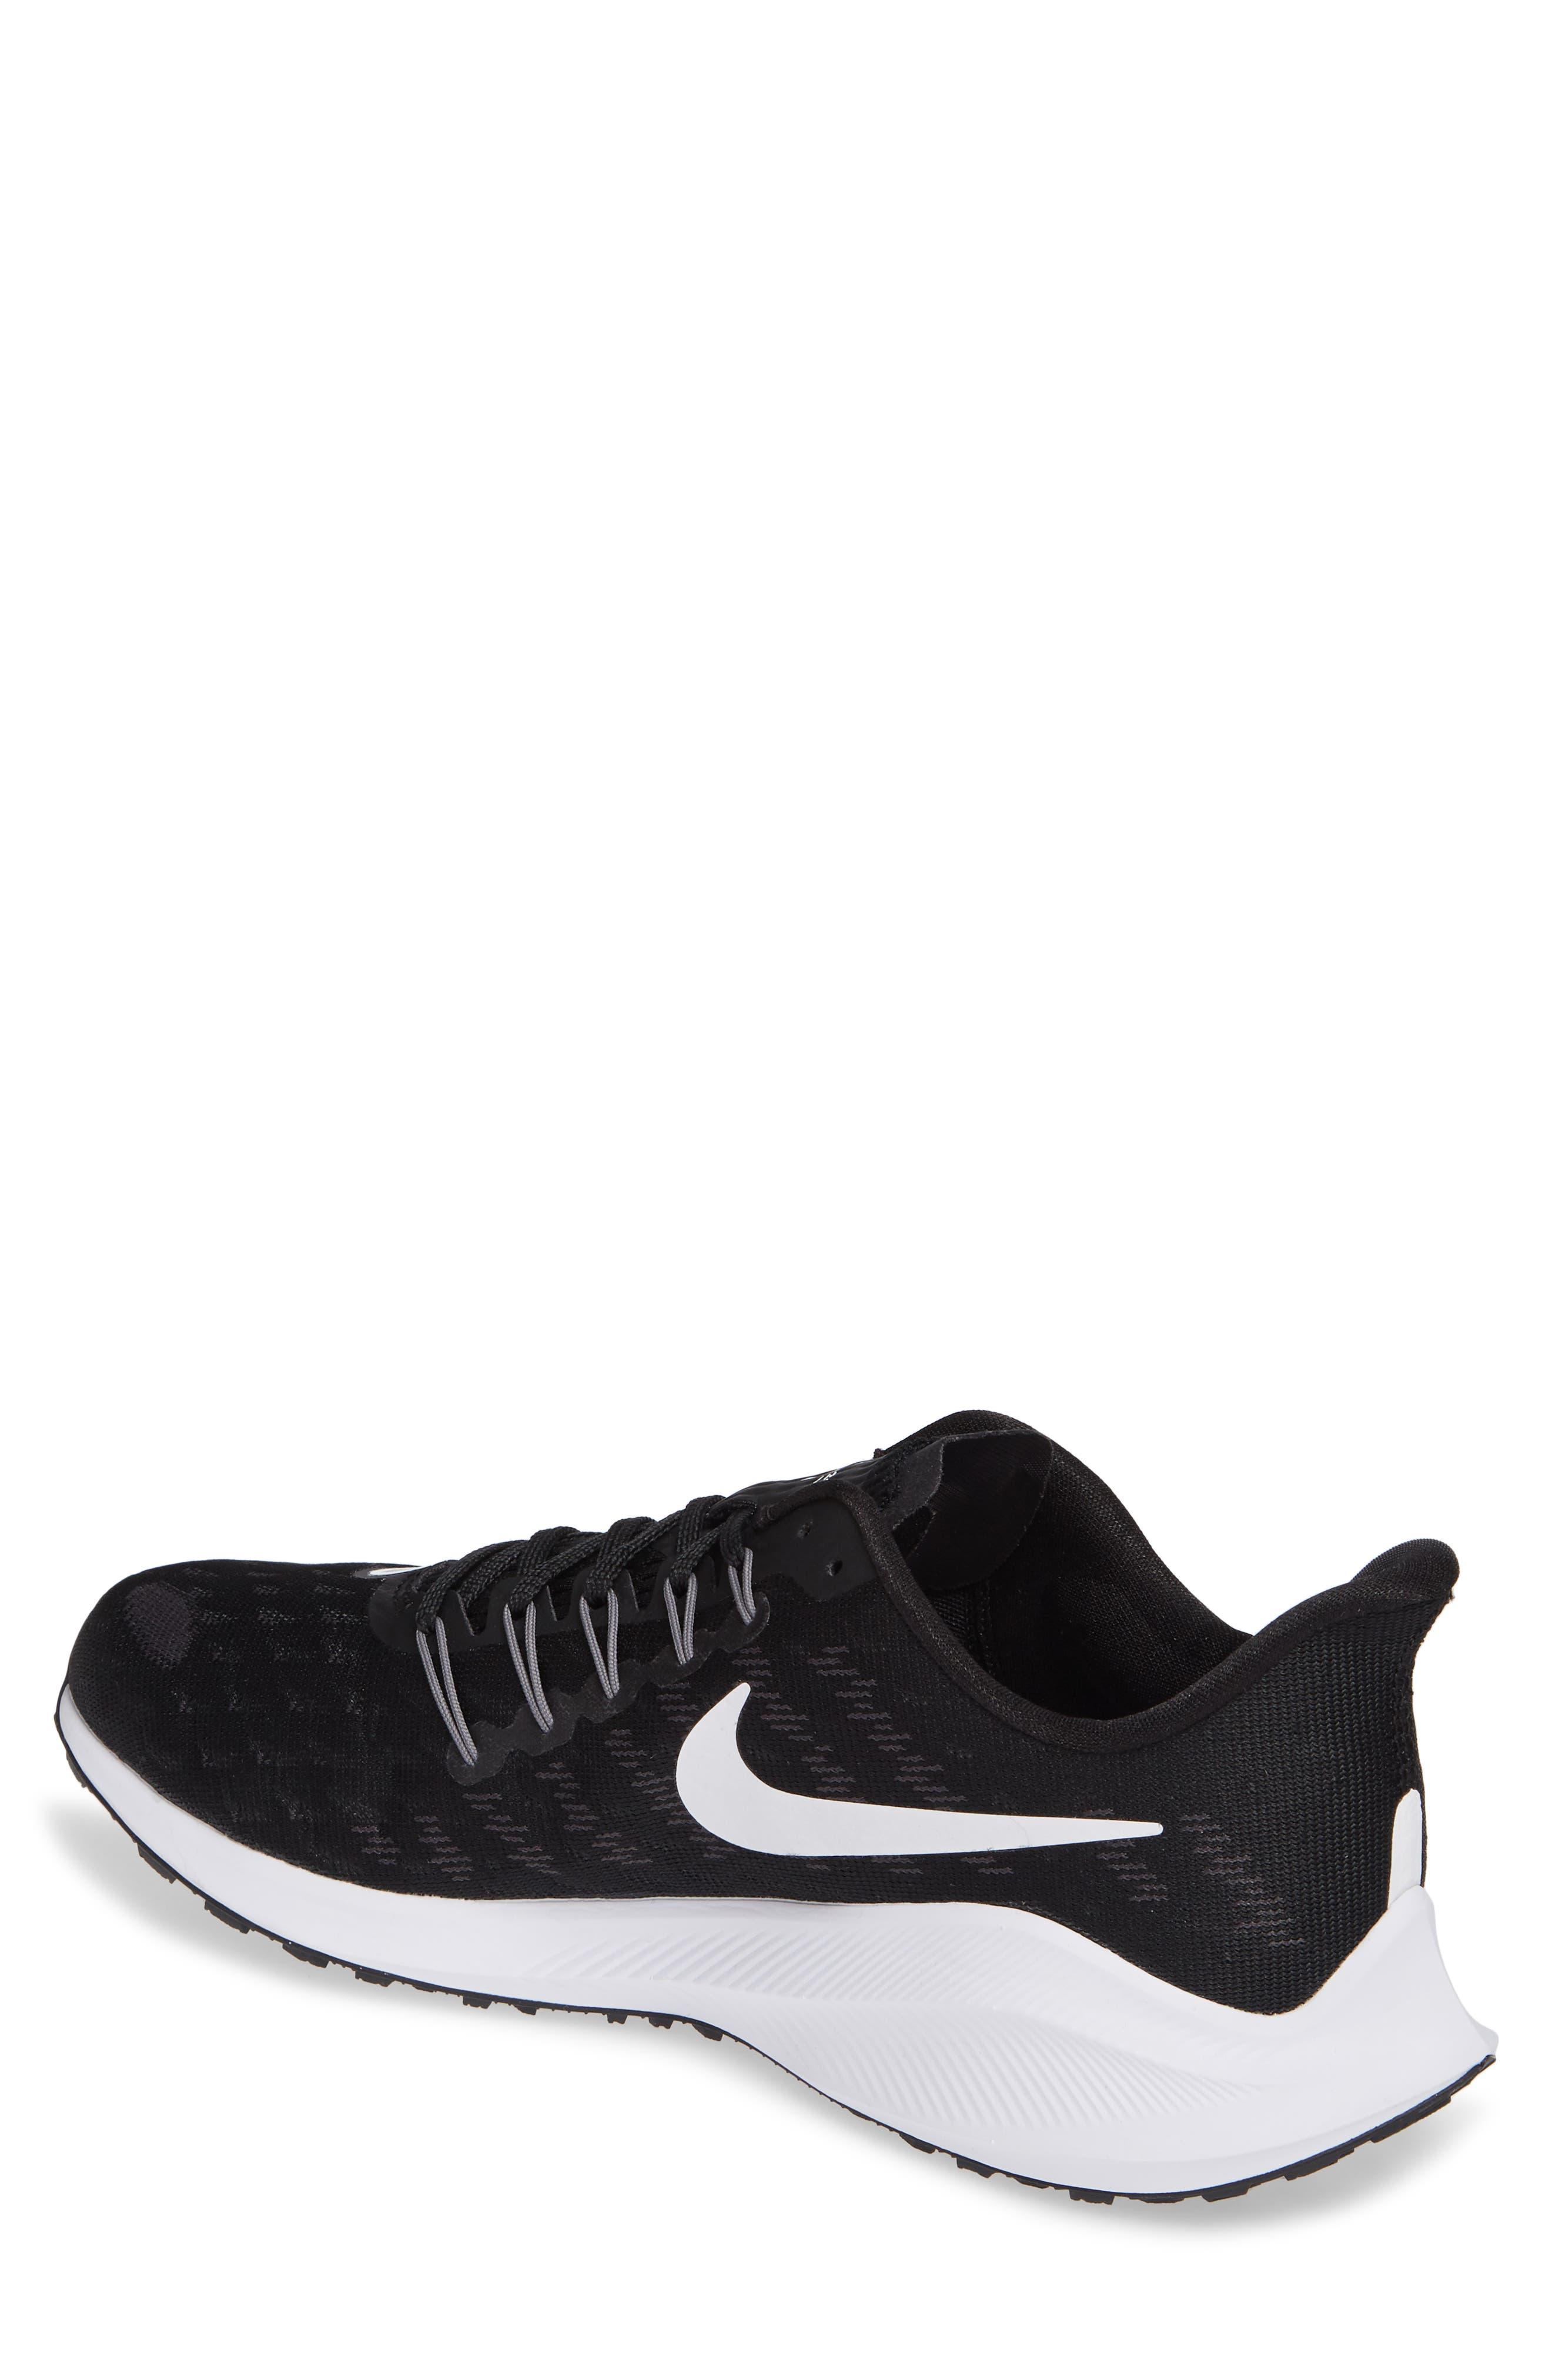 Air Zoom Vomero 14 Running Shoe,                             Alternate thumbnail 2, color,                             BLACK/ WHITE/ THUNDER GREY